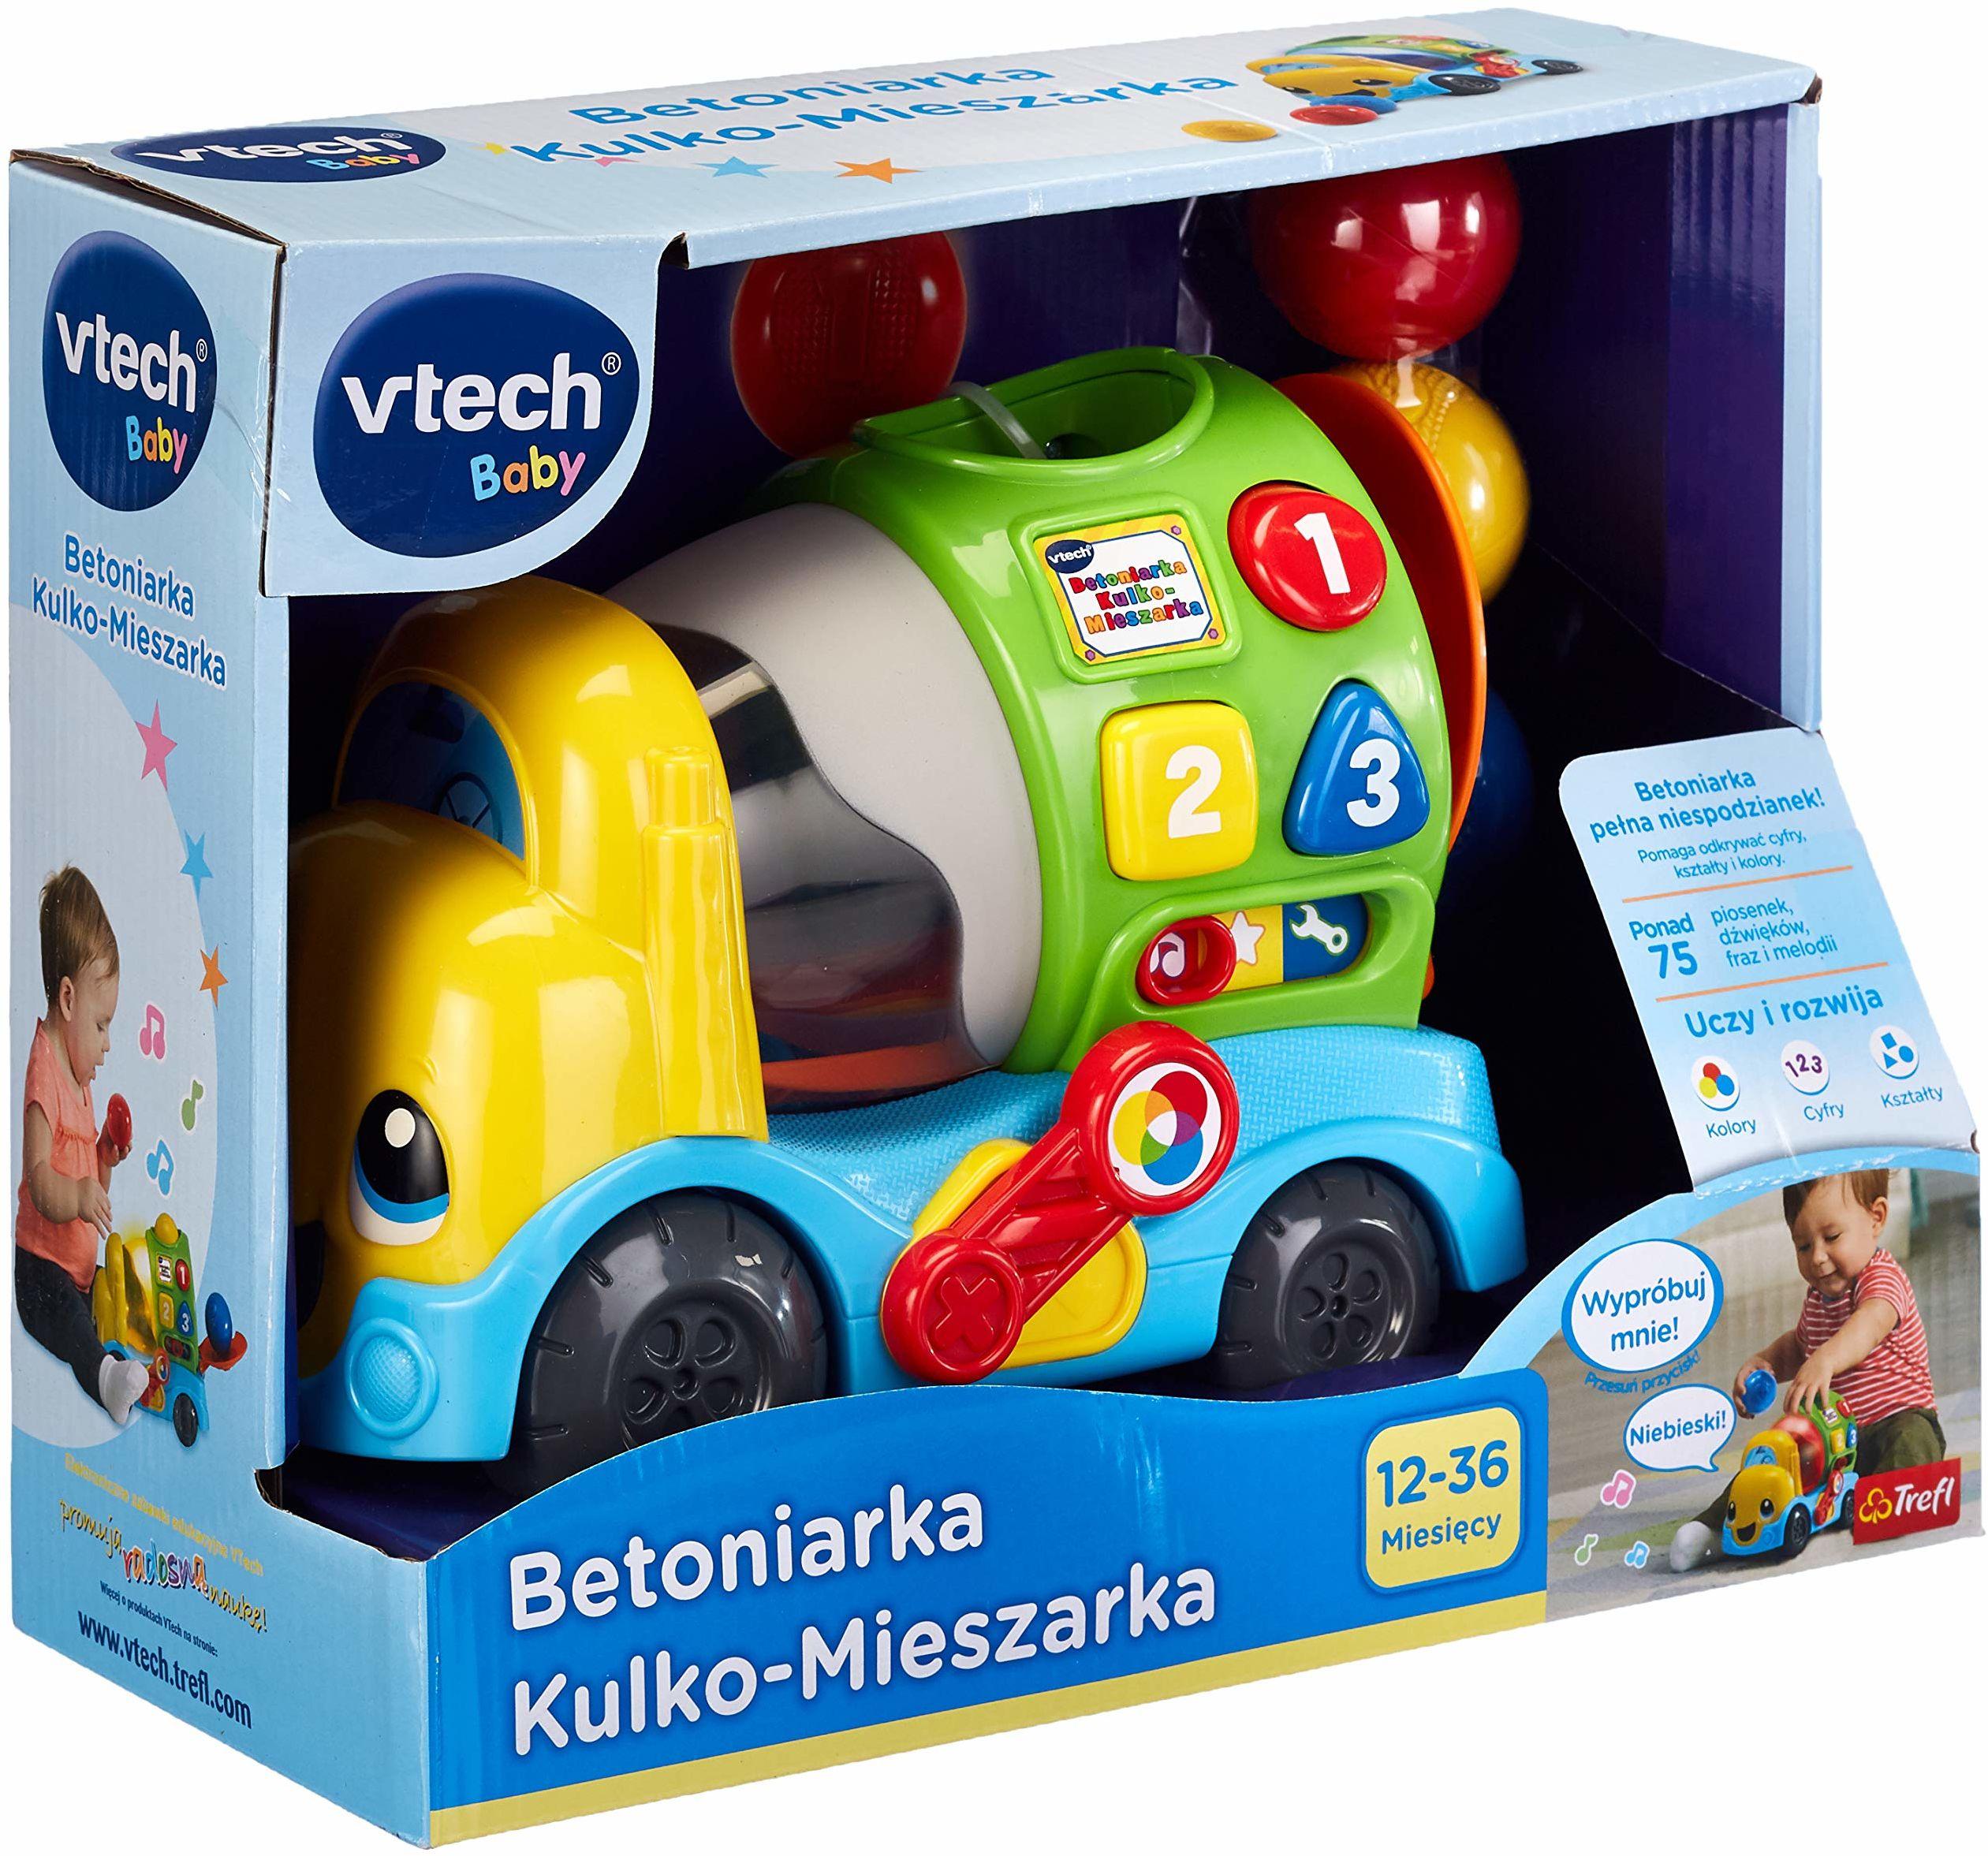 Vtech 60994,Betoniarka Kulko-Mieszarka 60994